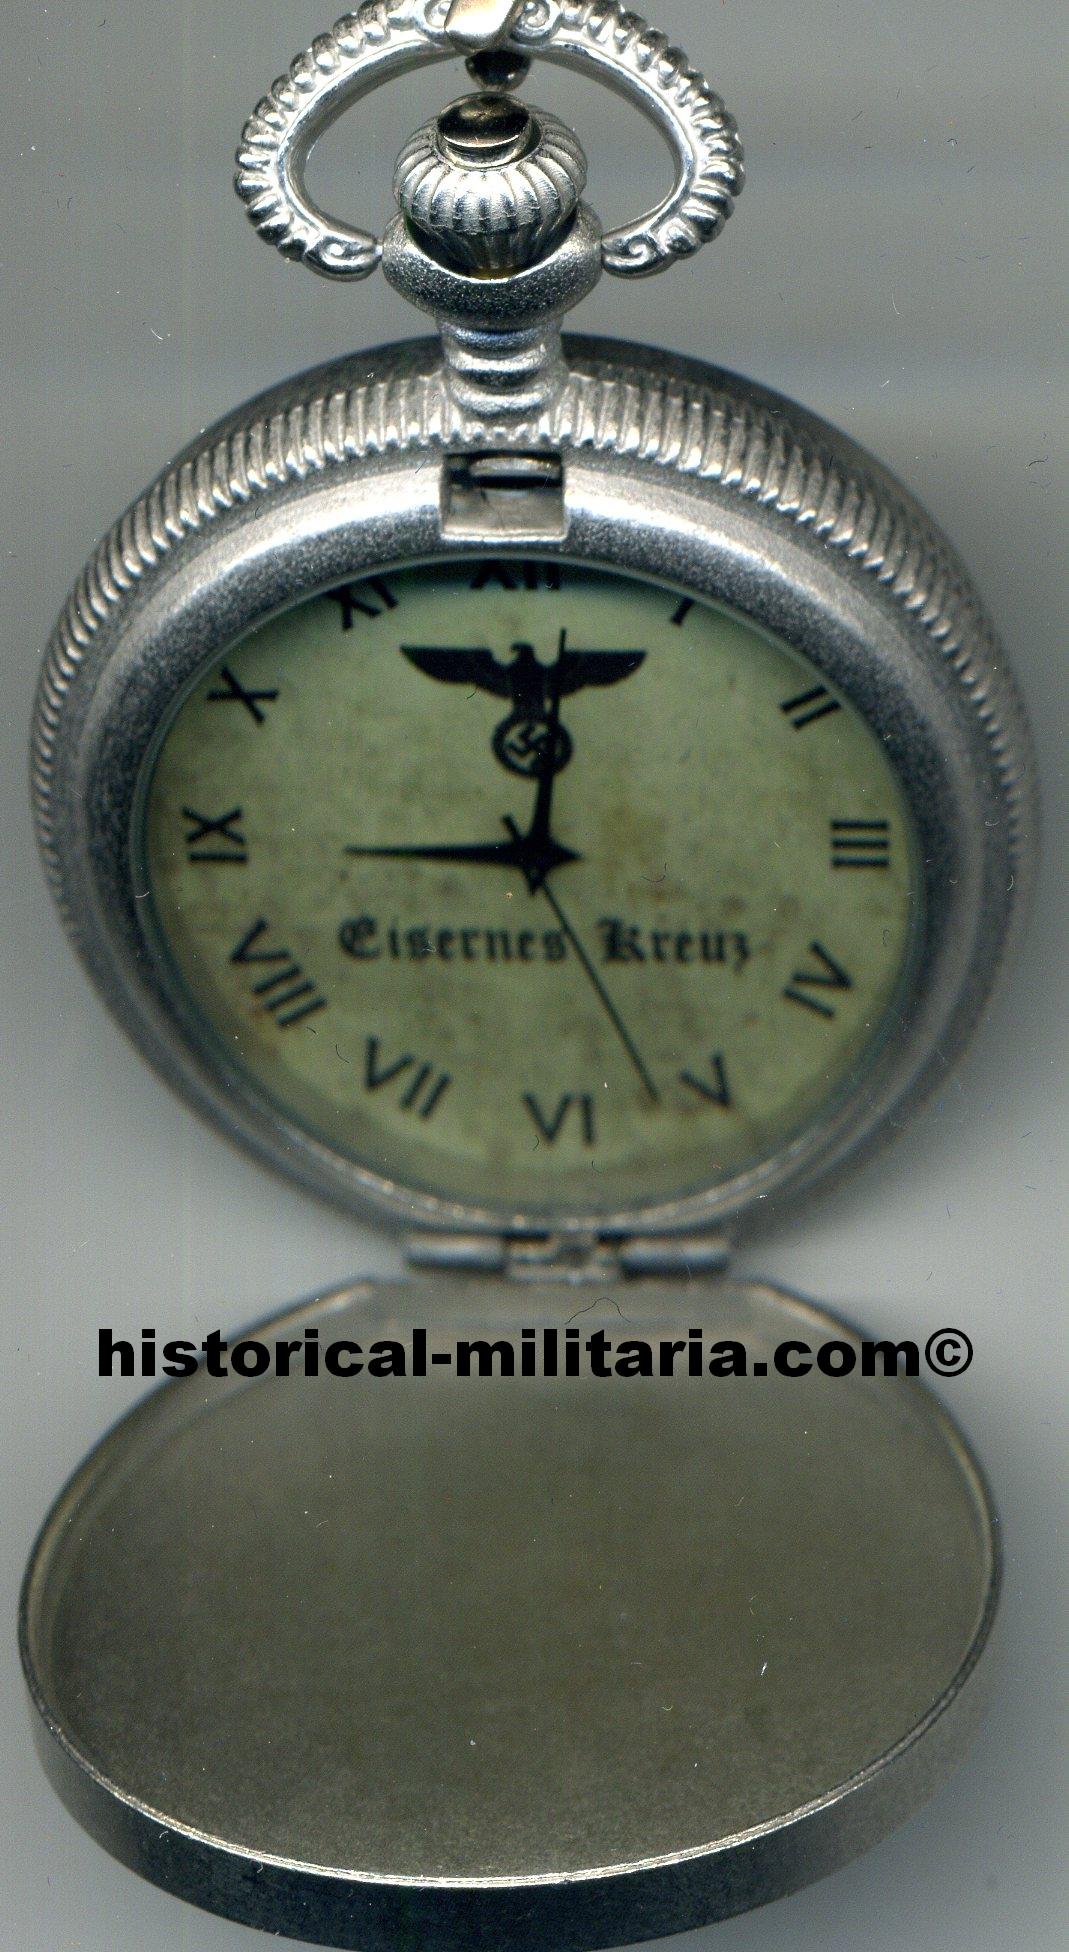 taschenuhr eisernes kreuz orologio da tasca croce di